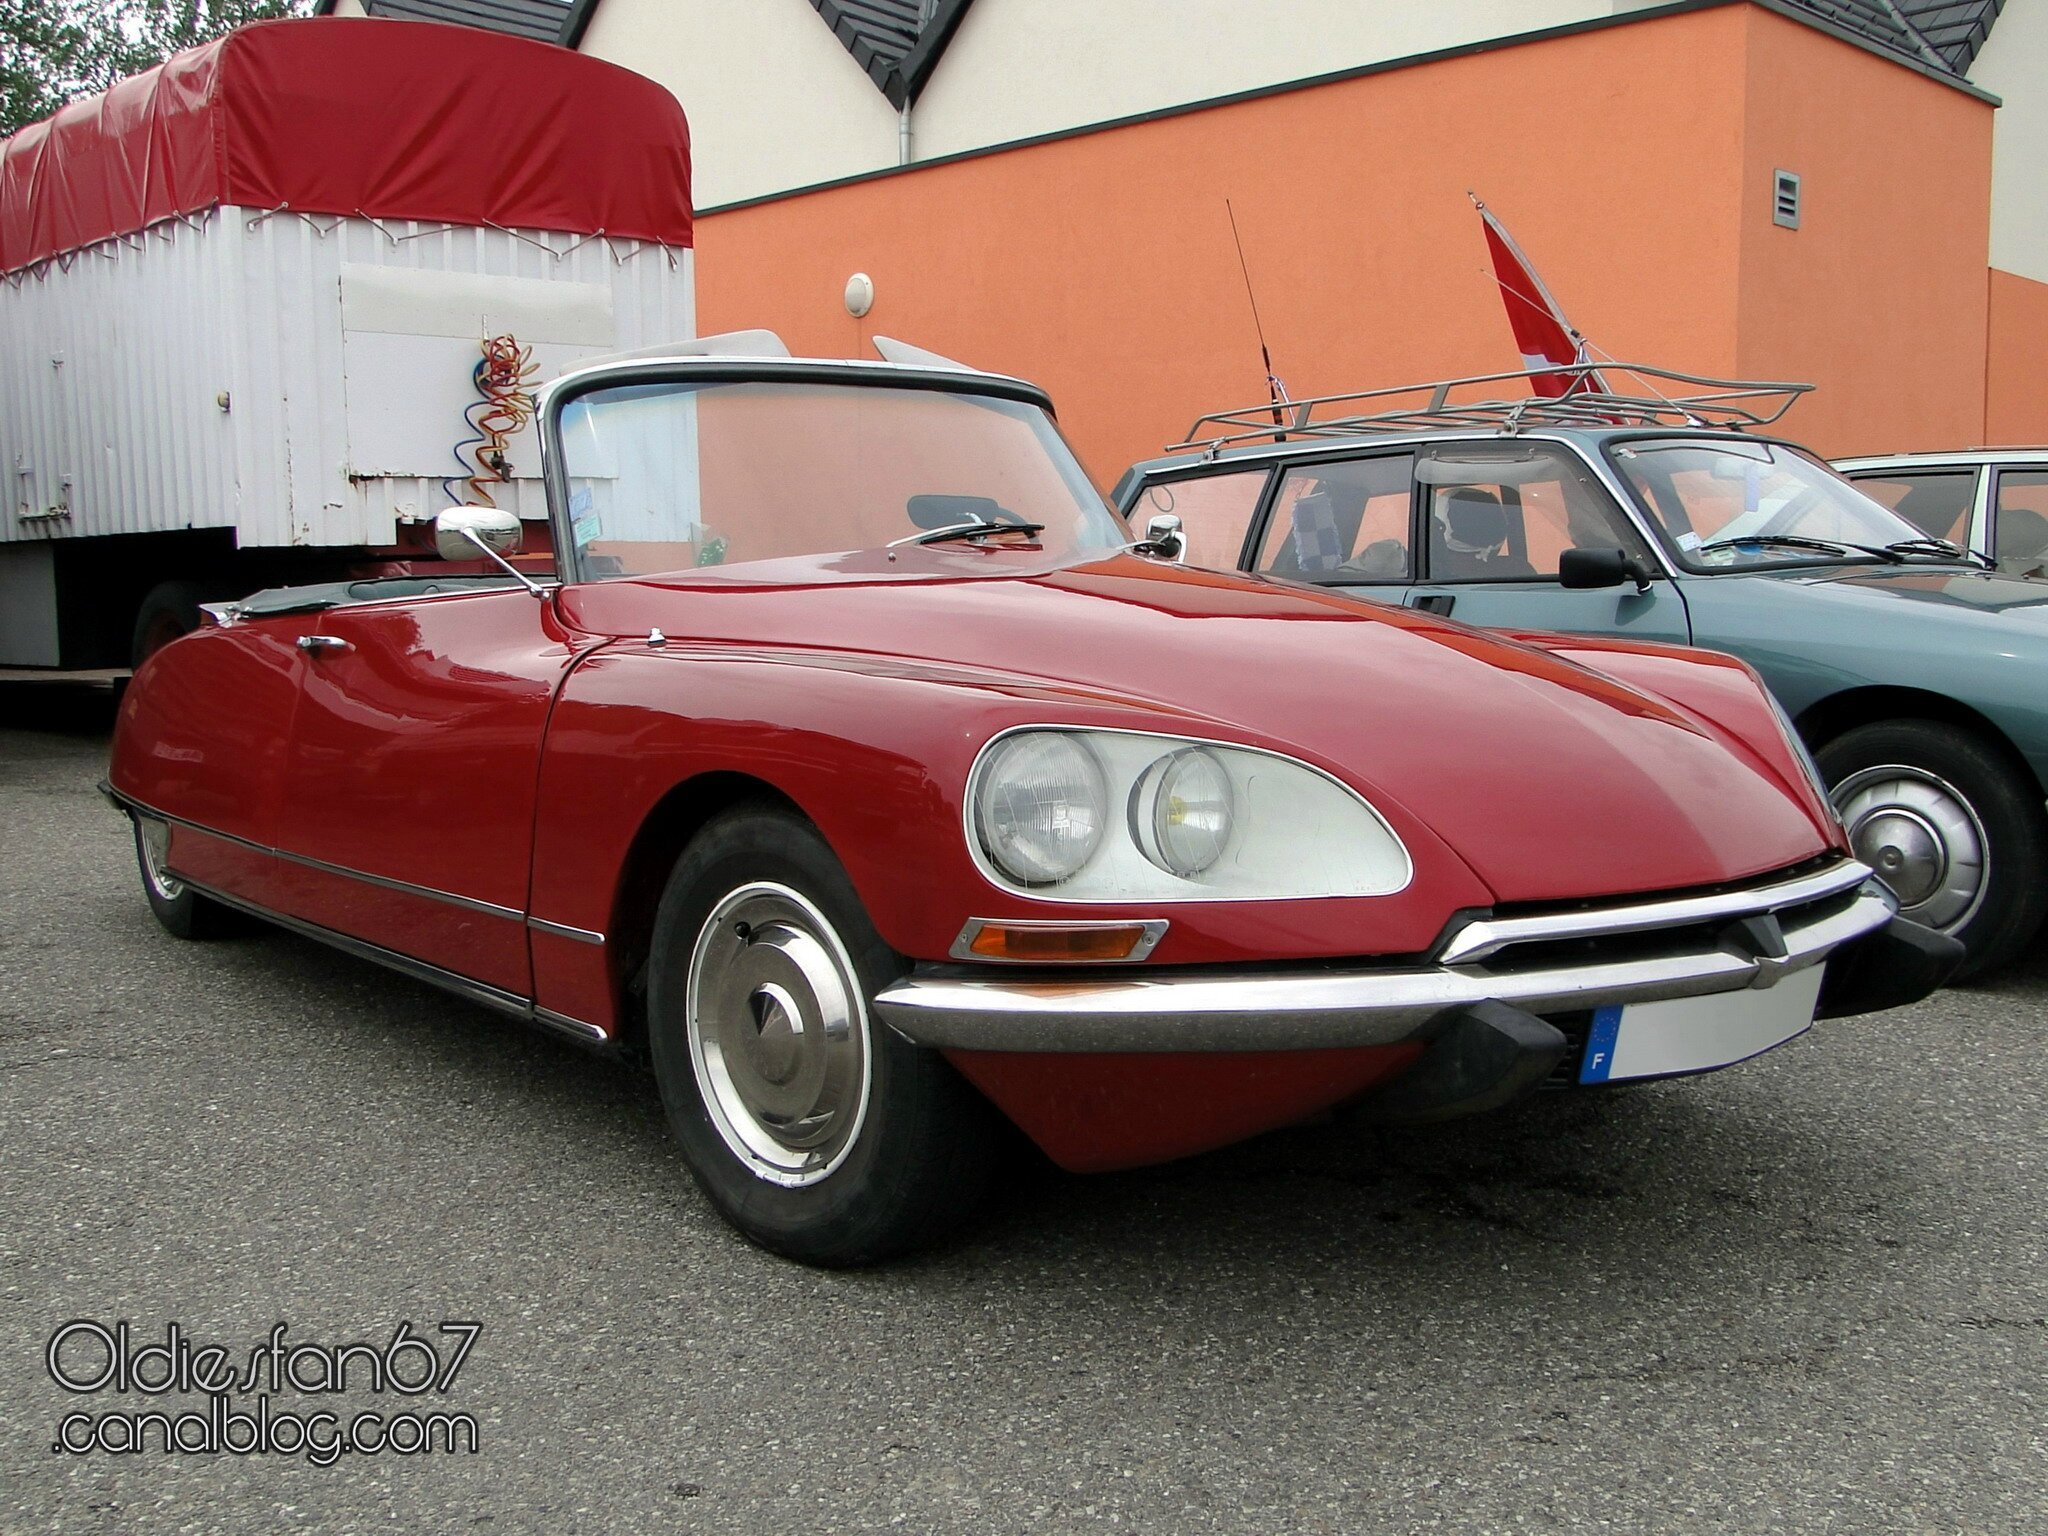 citro n ds 21 cabriolet 1968 1971 oldiesfan67 mon blog auto. Black Bedroom Furniture Sets. Home Design Ideas